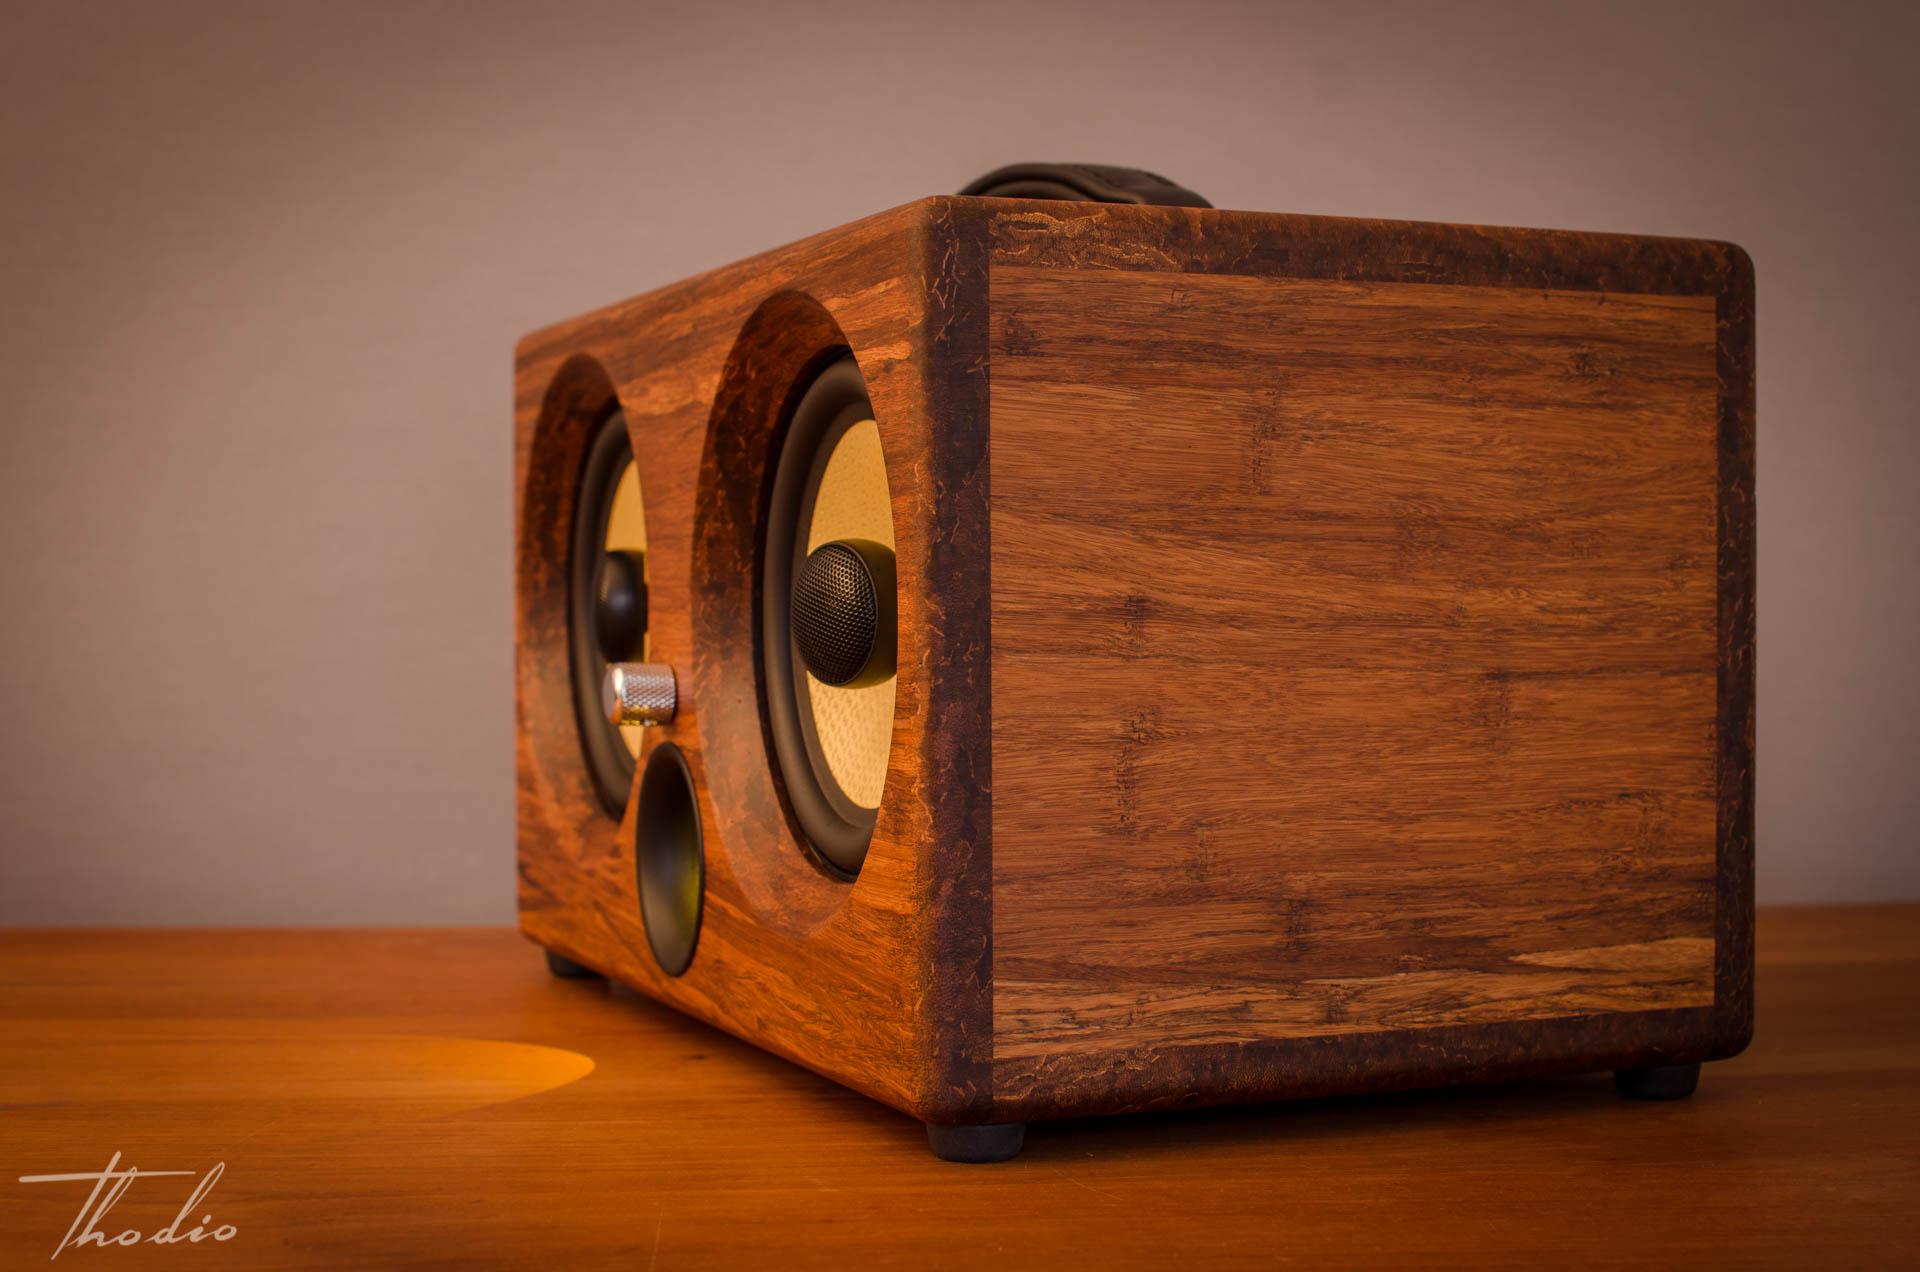 News Thodio The Best Wireless Smart Speakers